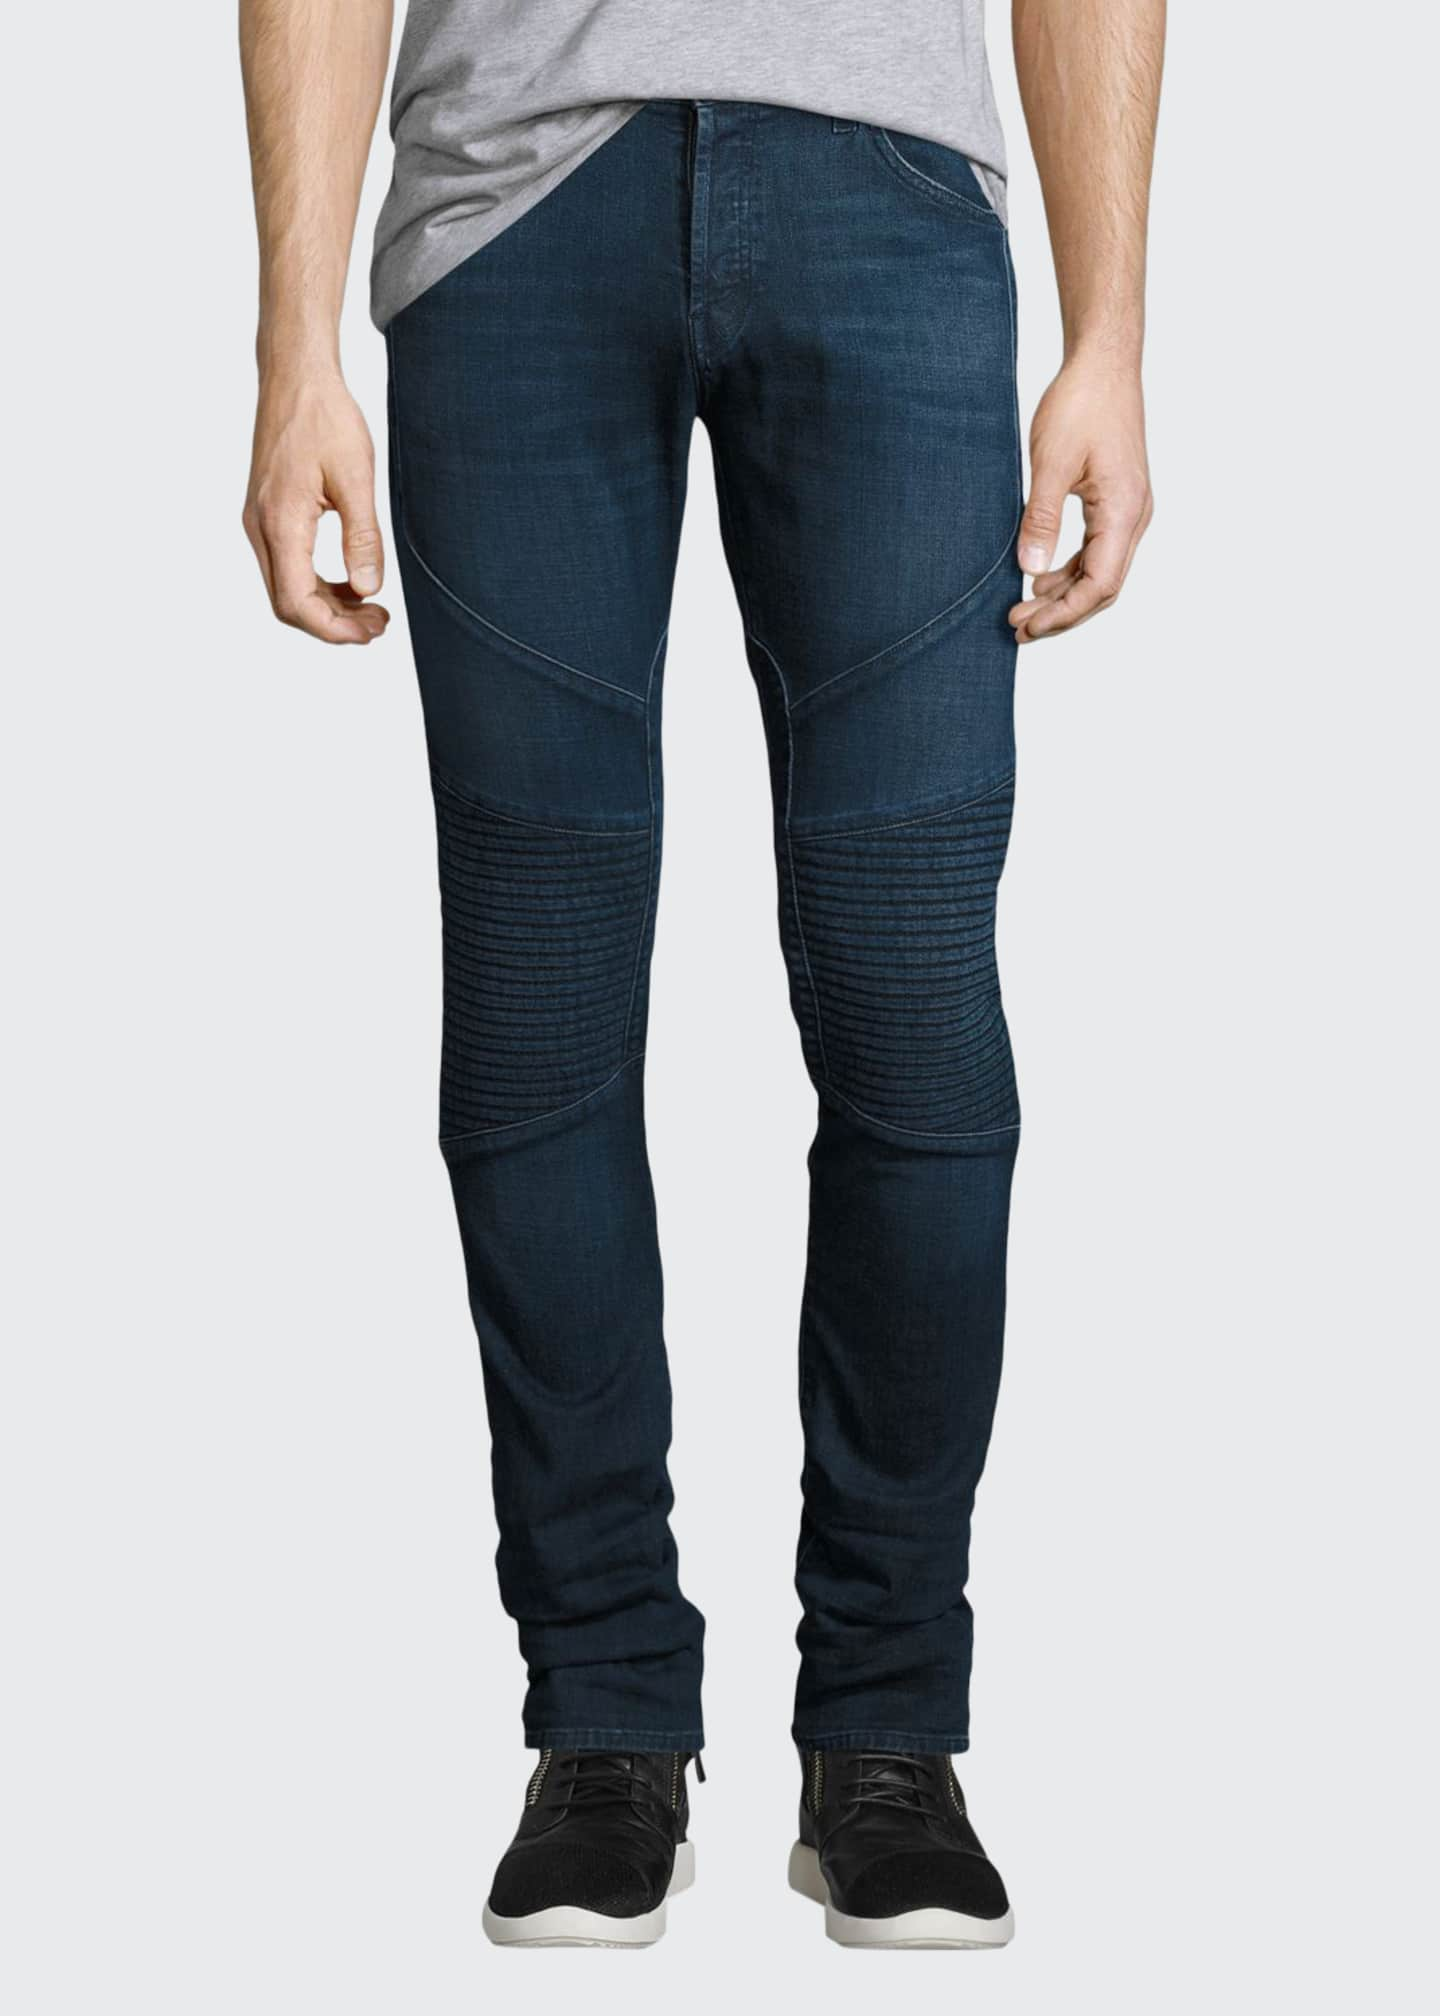 J Brand Bearden Moto Slim-Fit Jeans, Navy